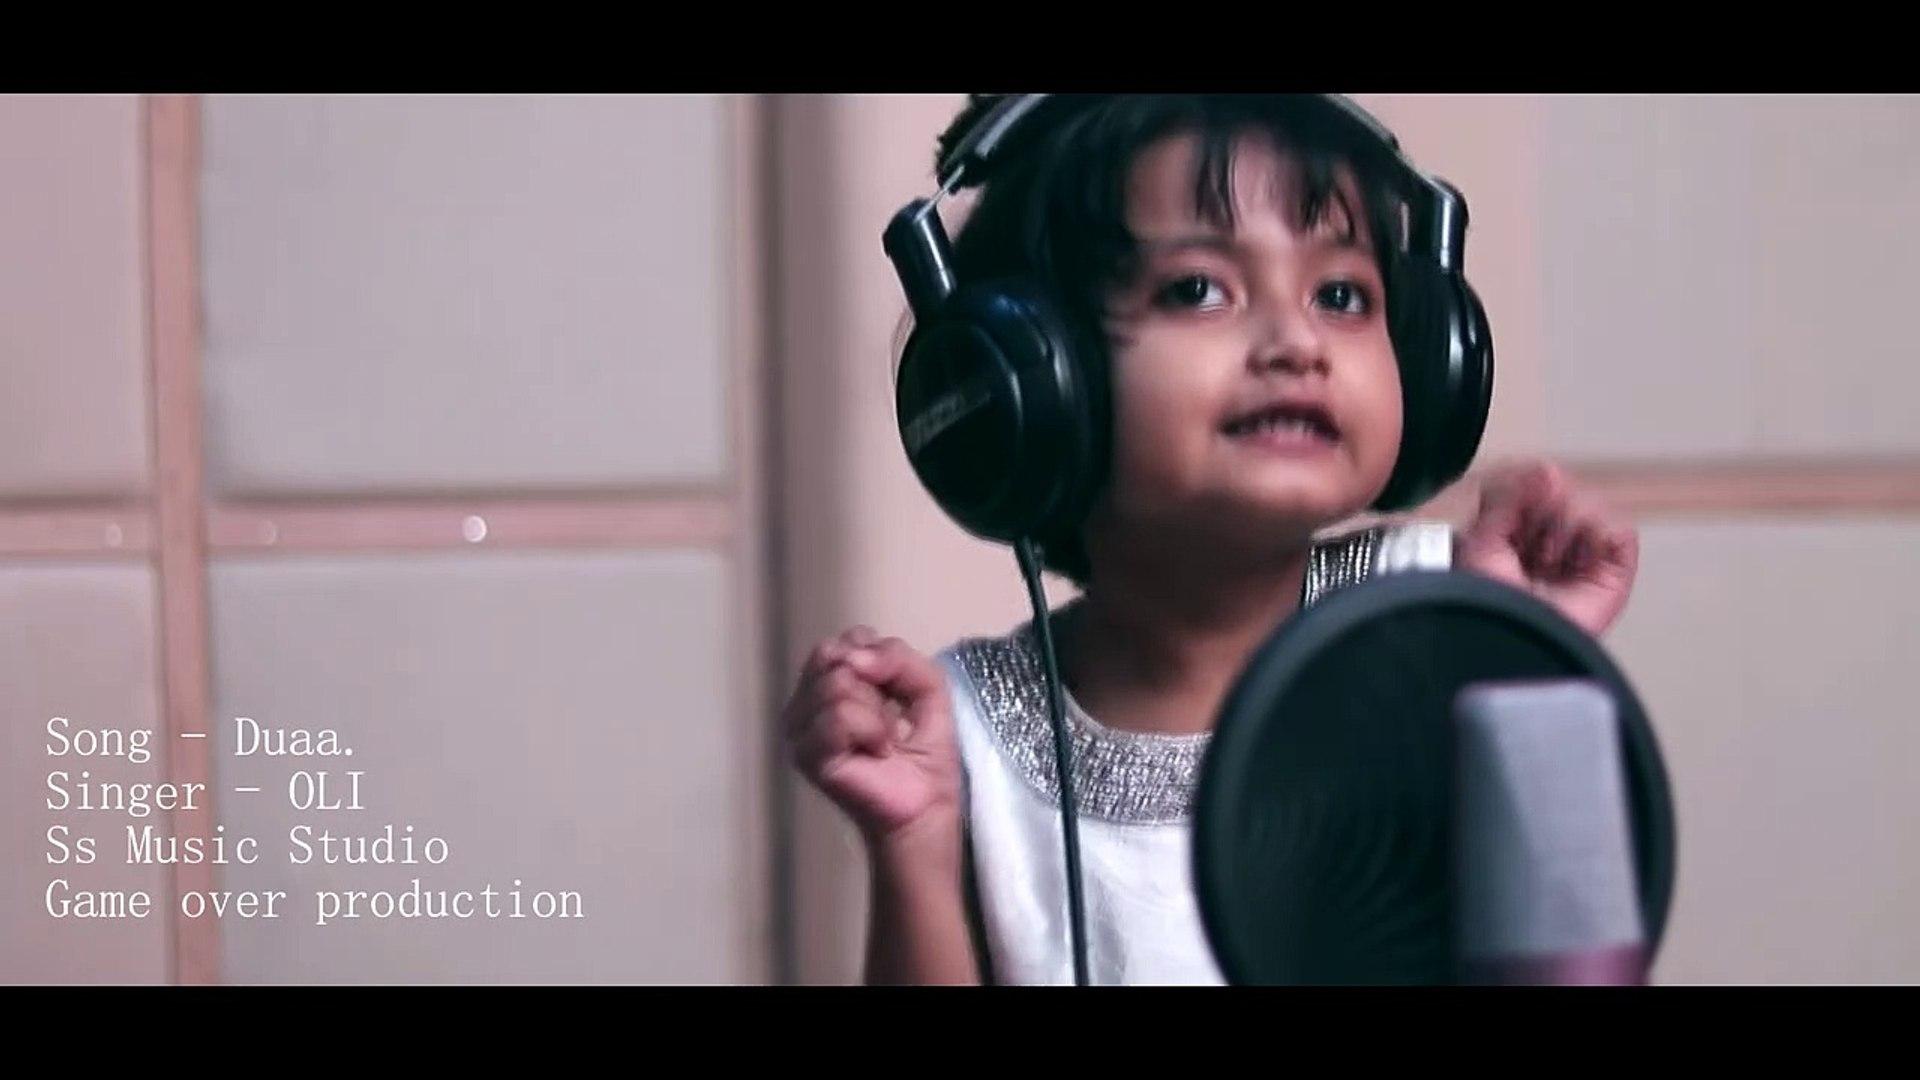 Duaa - Jo Bheji Thi Duaa - Full Song Cover by OLI - Shanghai - azzi Engineer